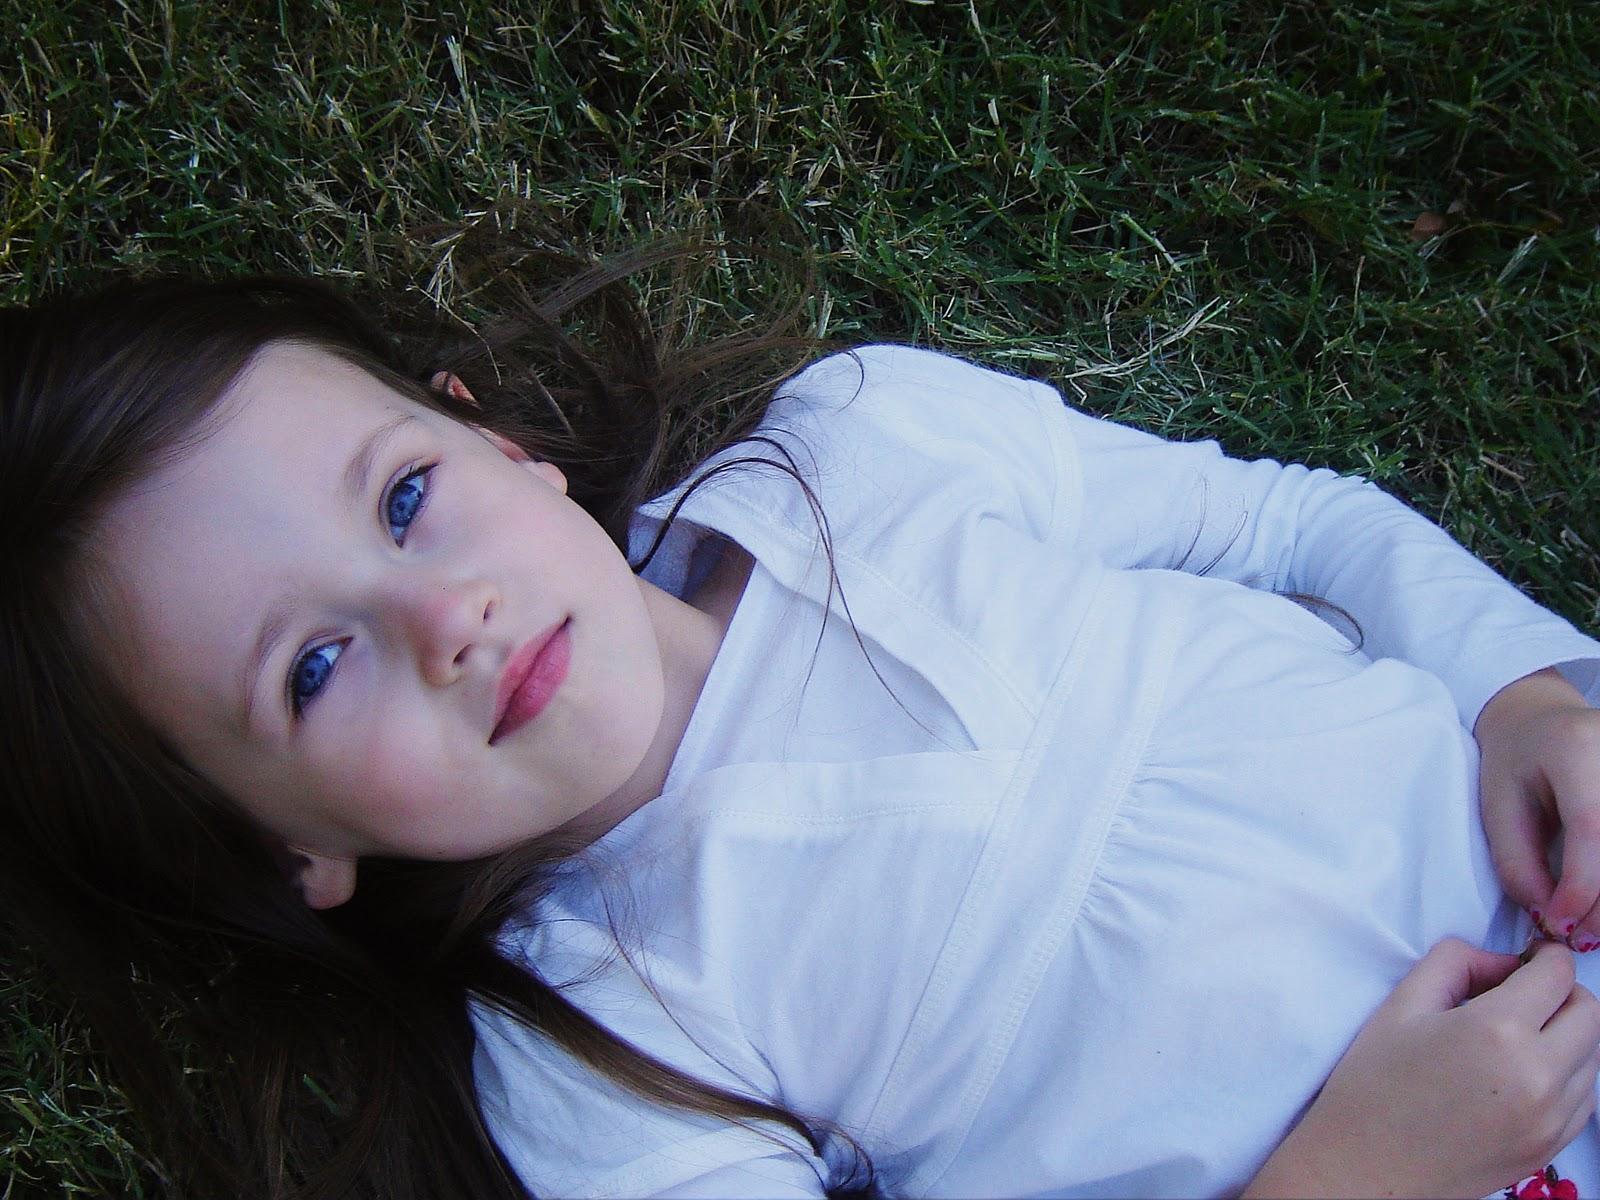 Image Bp Blogspot Com Schoolgirl Princess Image Anoword Search ...